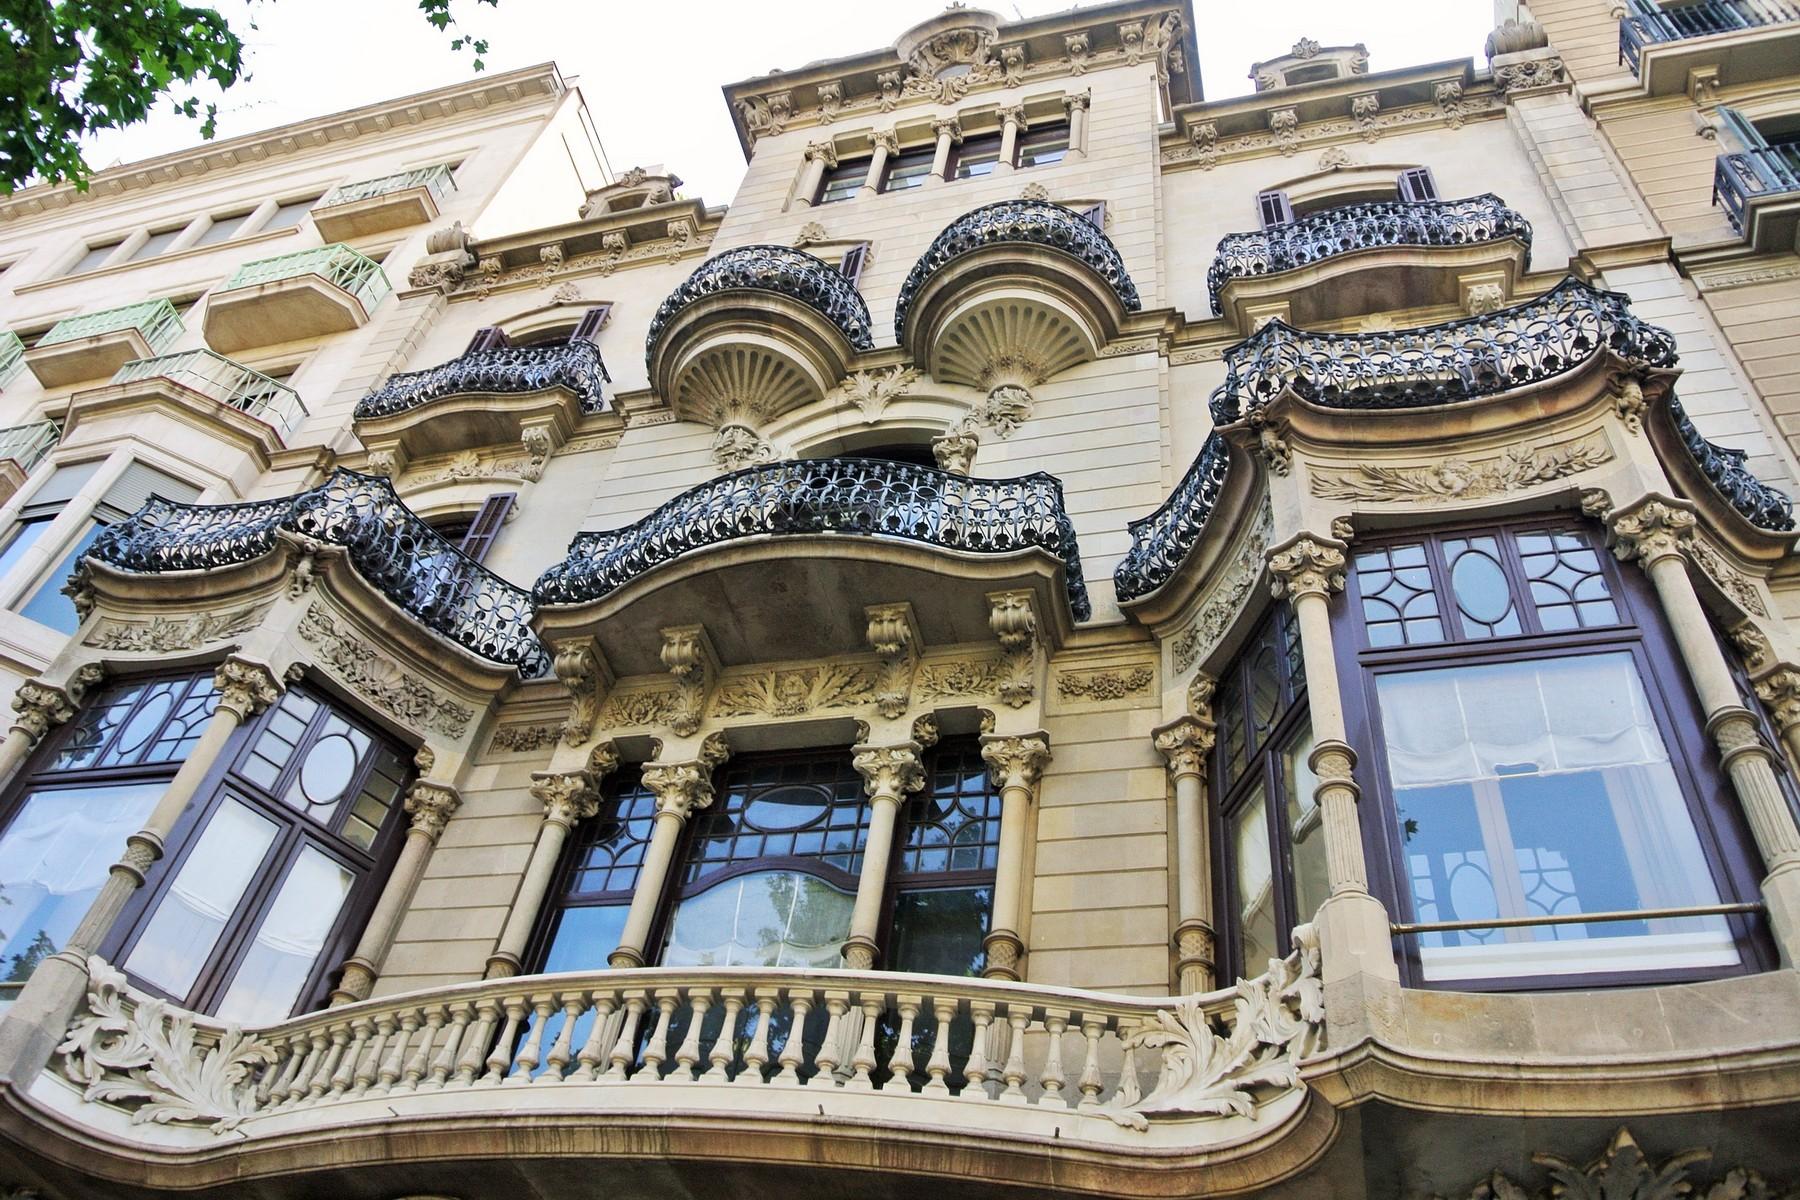 Barcelona, Passeig de Gracia, Casa Lleo Morera